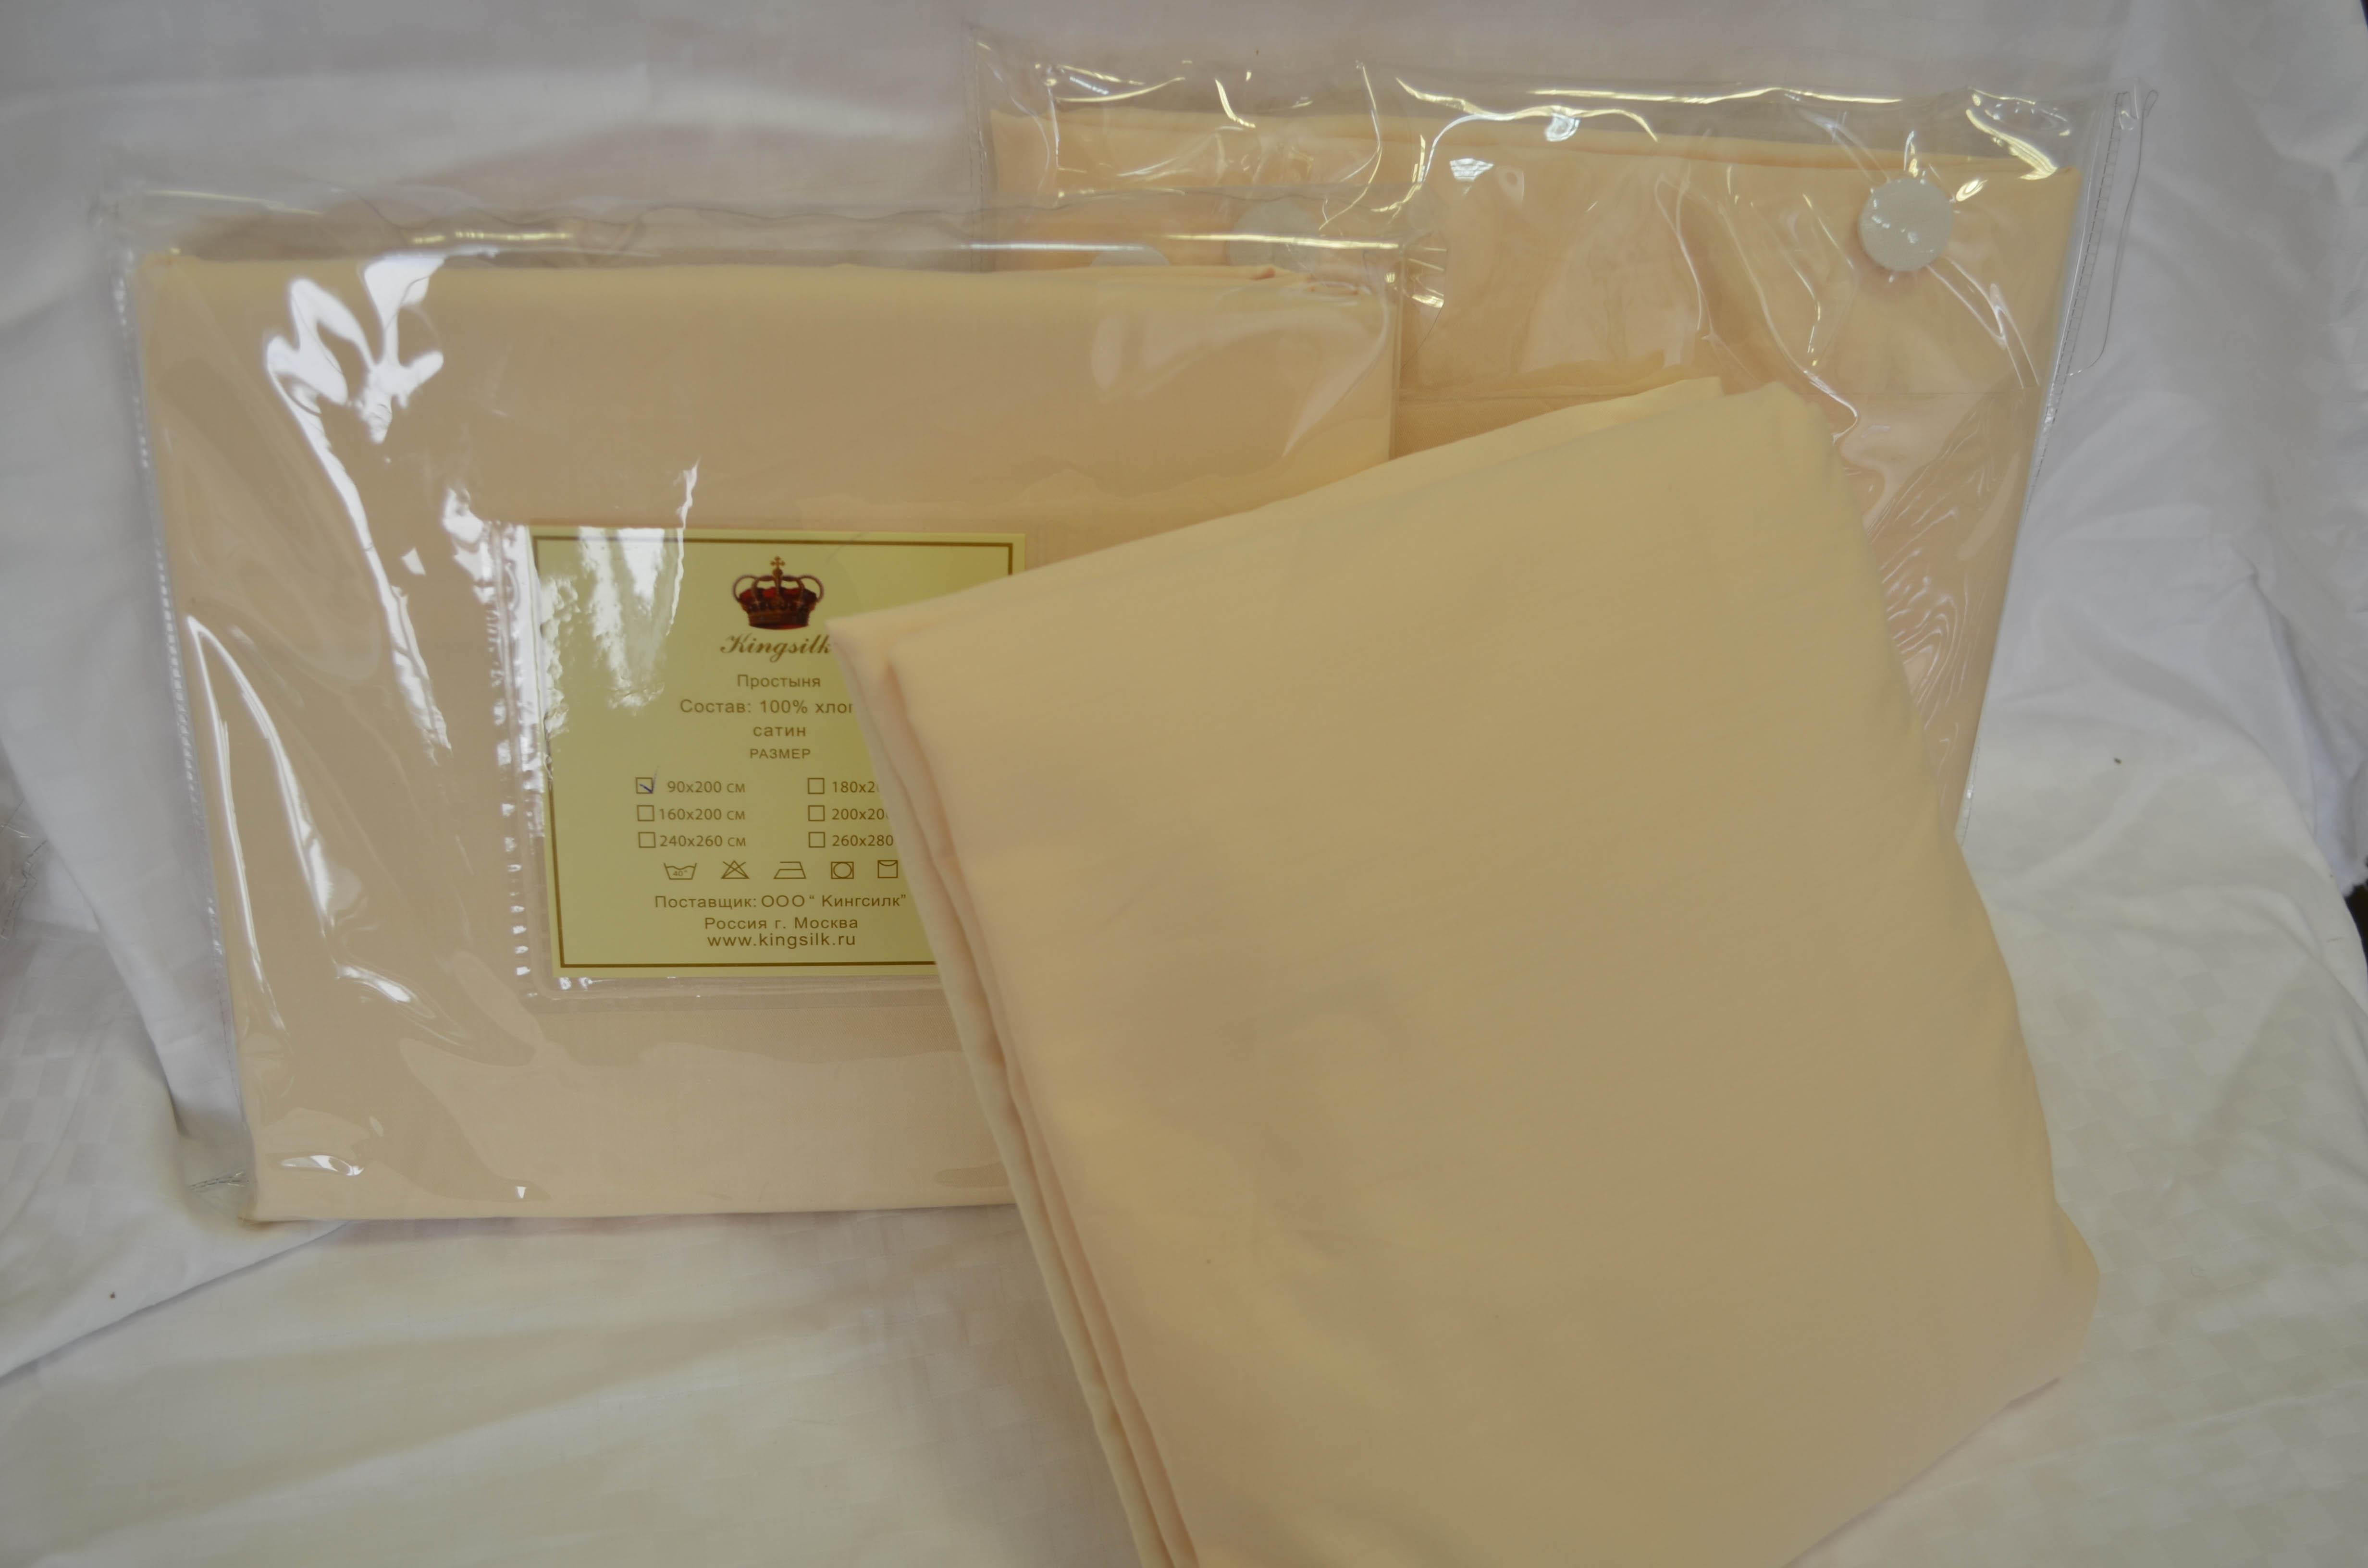 Простыни KingSilk Простыня Nic Цвет: Кремовый (260х280) kingsilk простыня nic цвет розовый 240х260 см